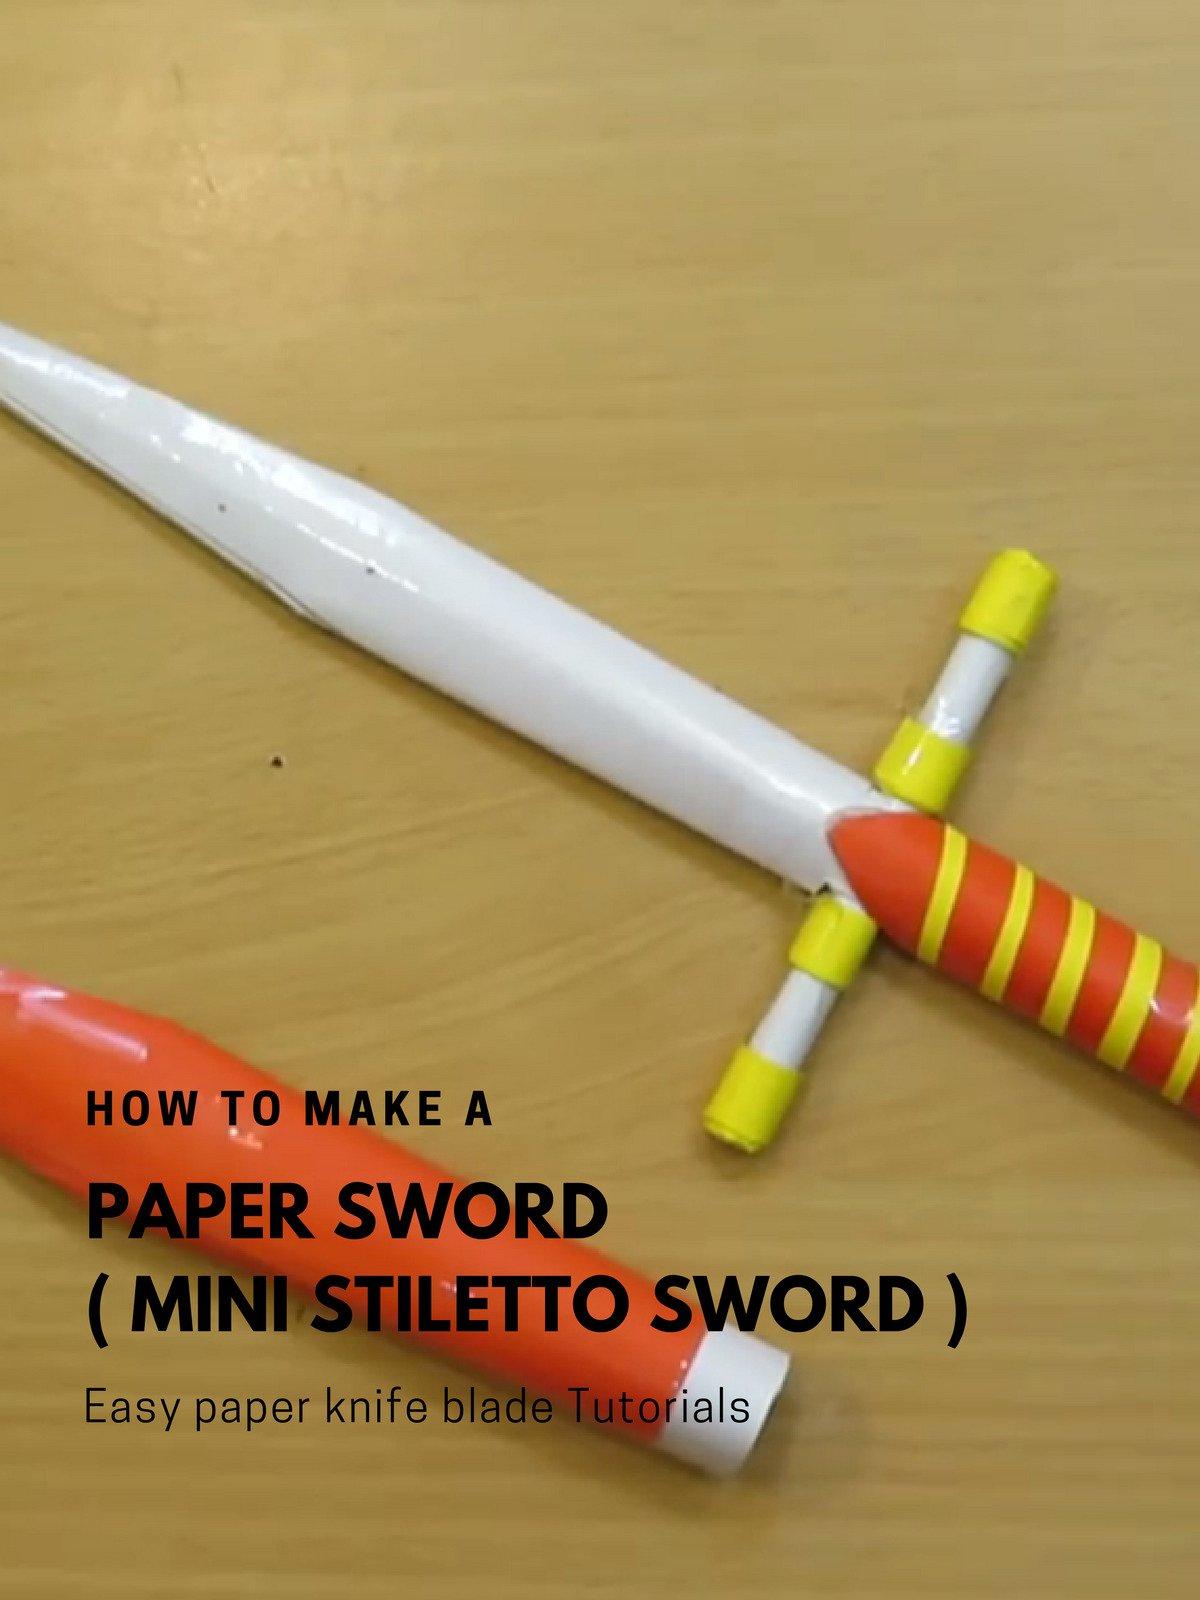 Amazon com: Watch How to Make a paper Sword (Mini Stiletto